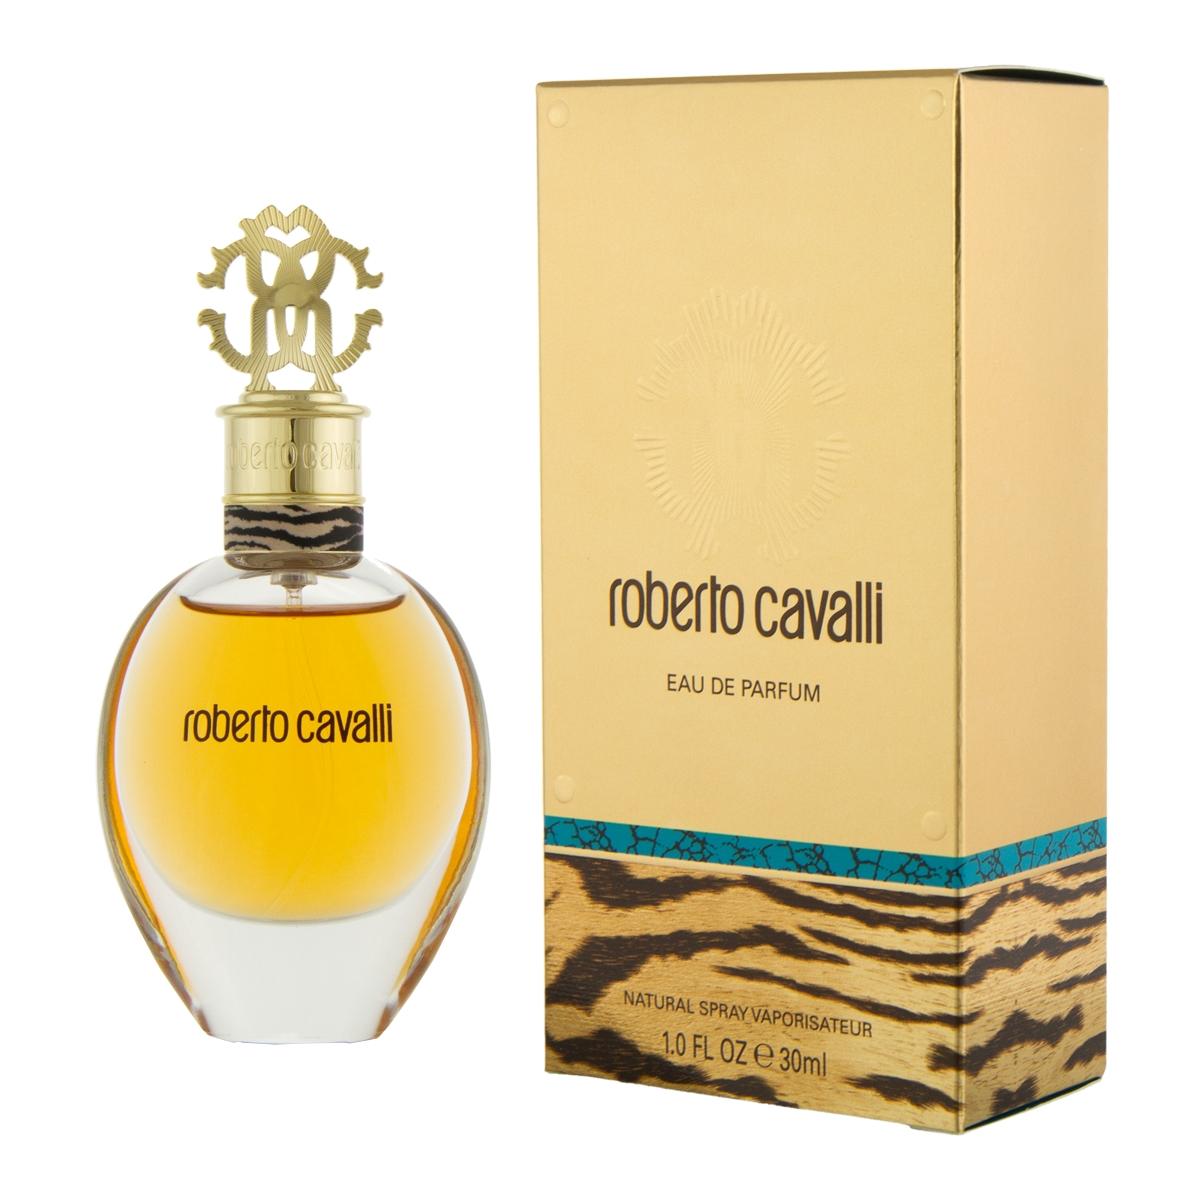 Roberto Cavalli Roberto Cavalli Eau de Parfum Eau De Parfum 30 ml (woman) 67132